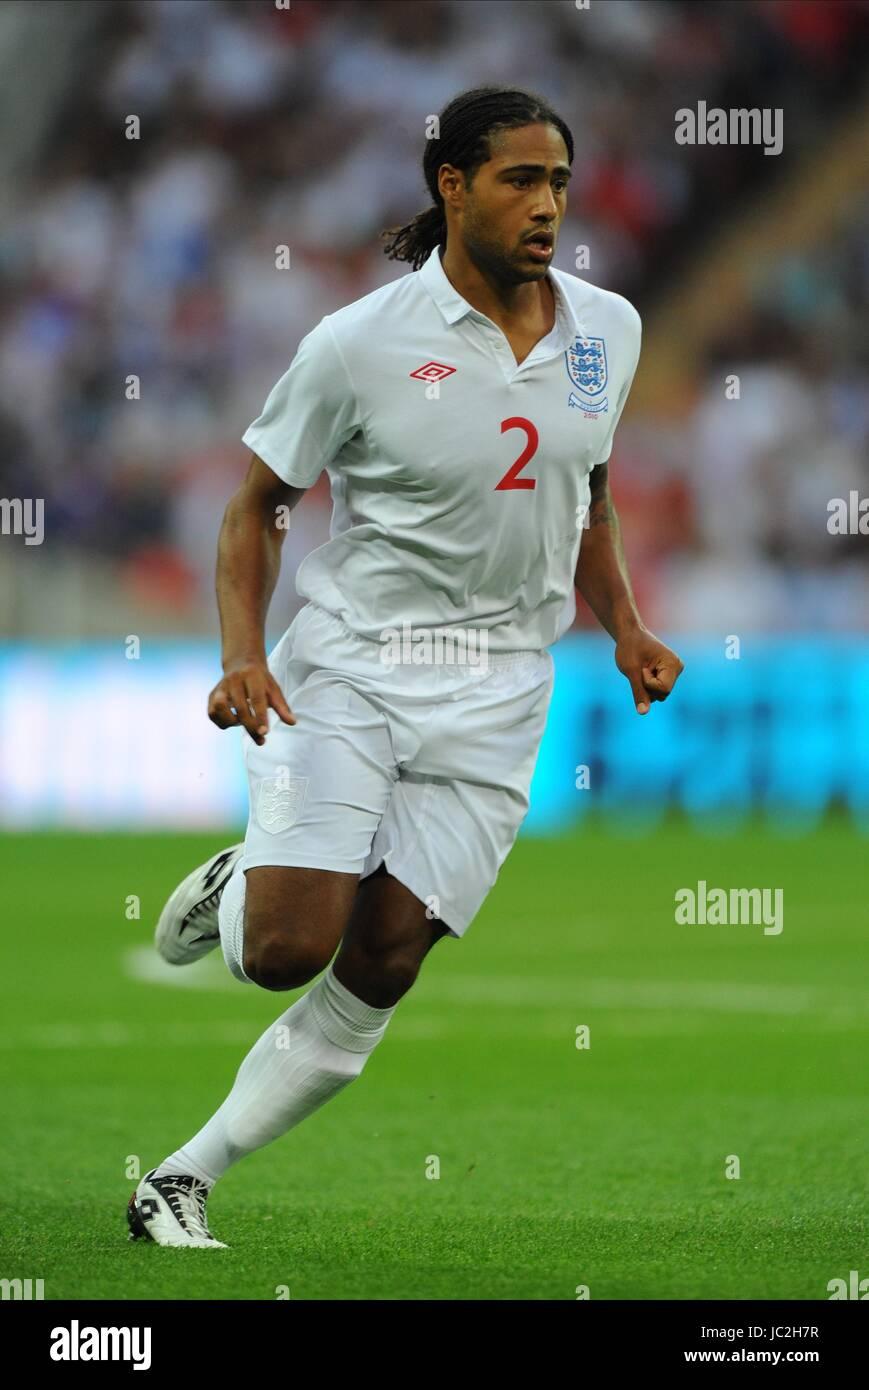 GLEN JOHNSON ENGLAND WEMBLEY STADIUM LONDON ENGLAND 11 August 2010 - Stock Image